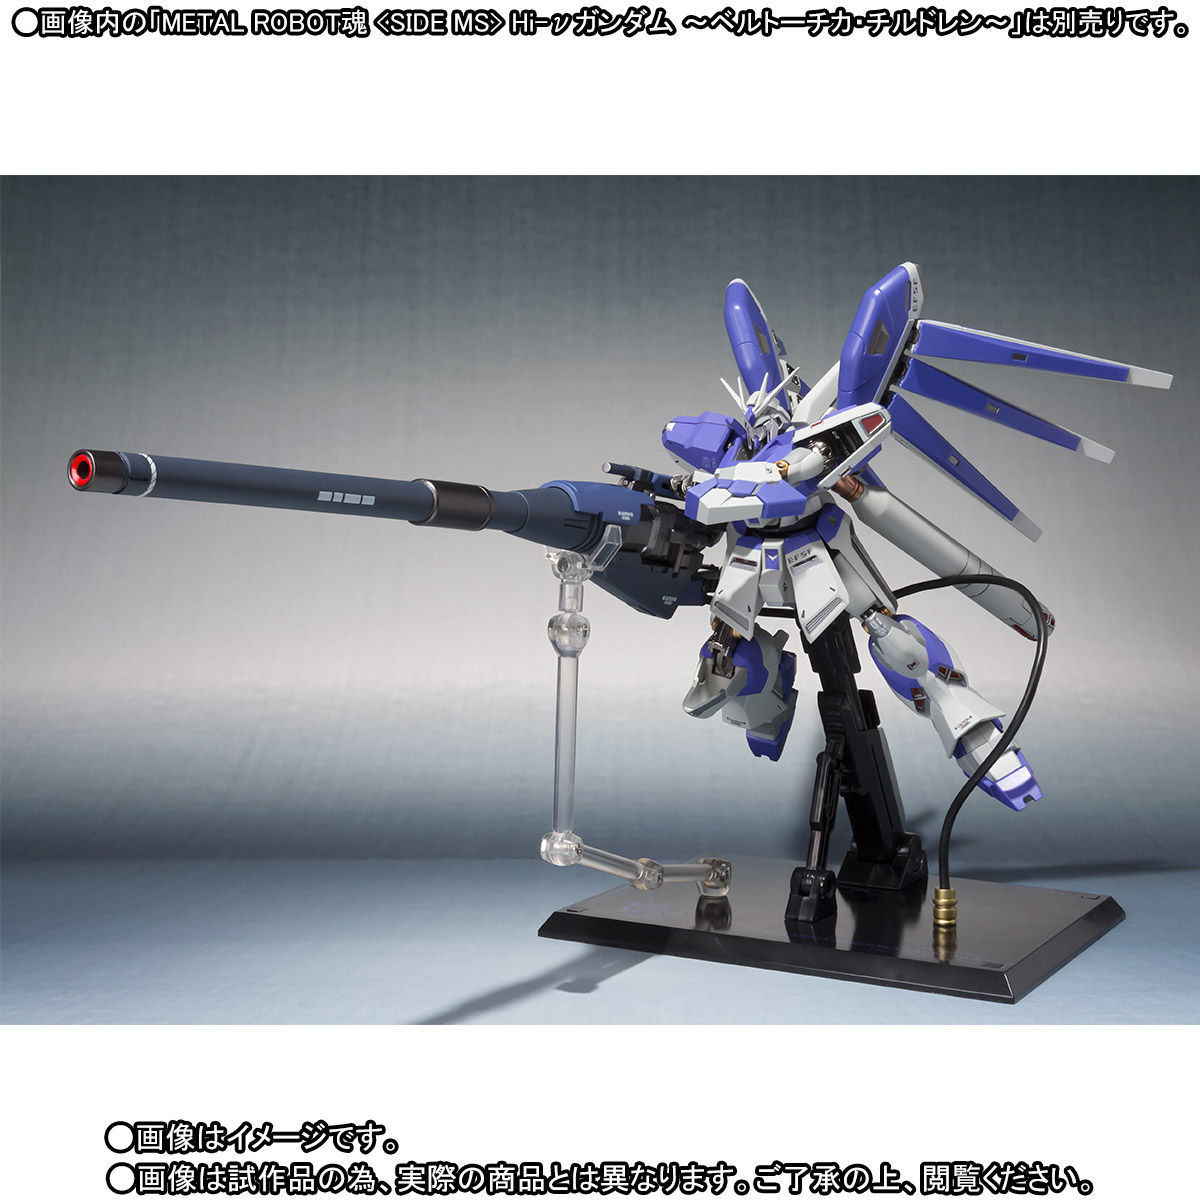 METAL ROBOT魂〈SIDE MS〉『Hi-νガンダム専用ハイパー・メガ・バズーカ・ランチャー』パーツセット-003